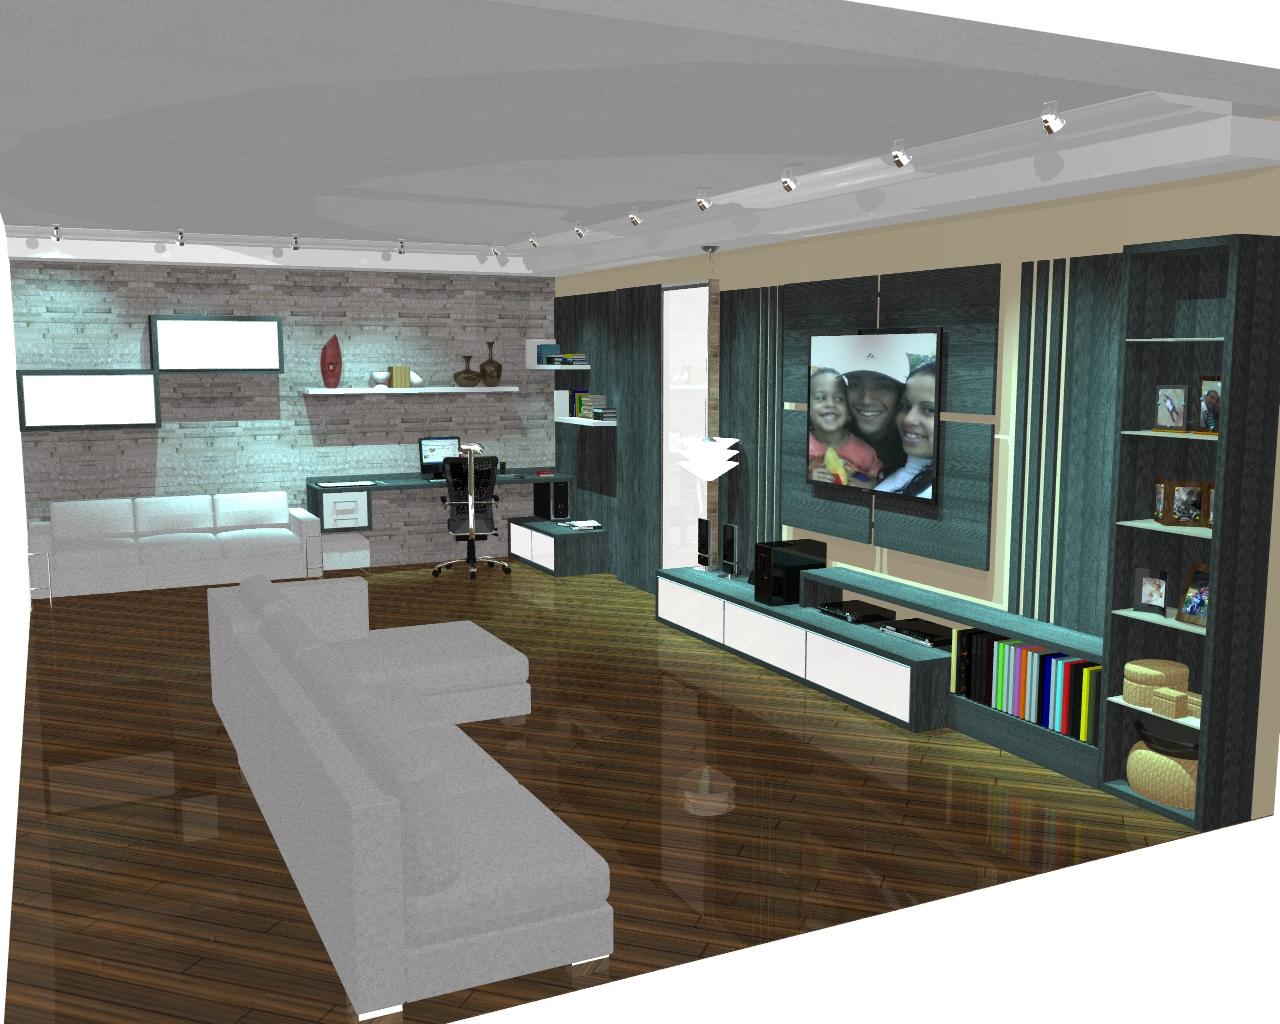 projeto de kleber souza arte cozinhas italínea projeto de barbara #5D4832 1280 1024